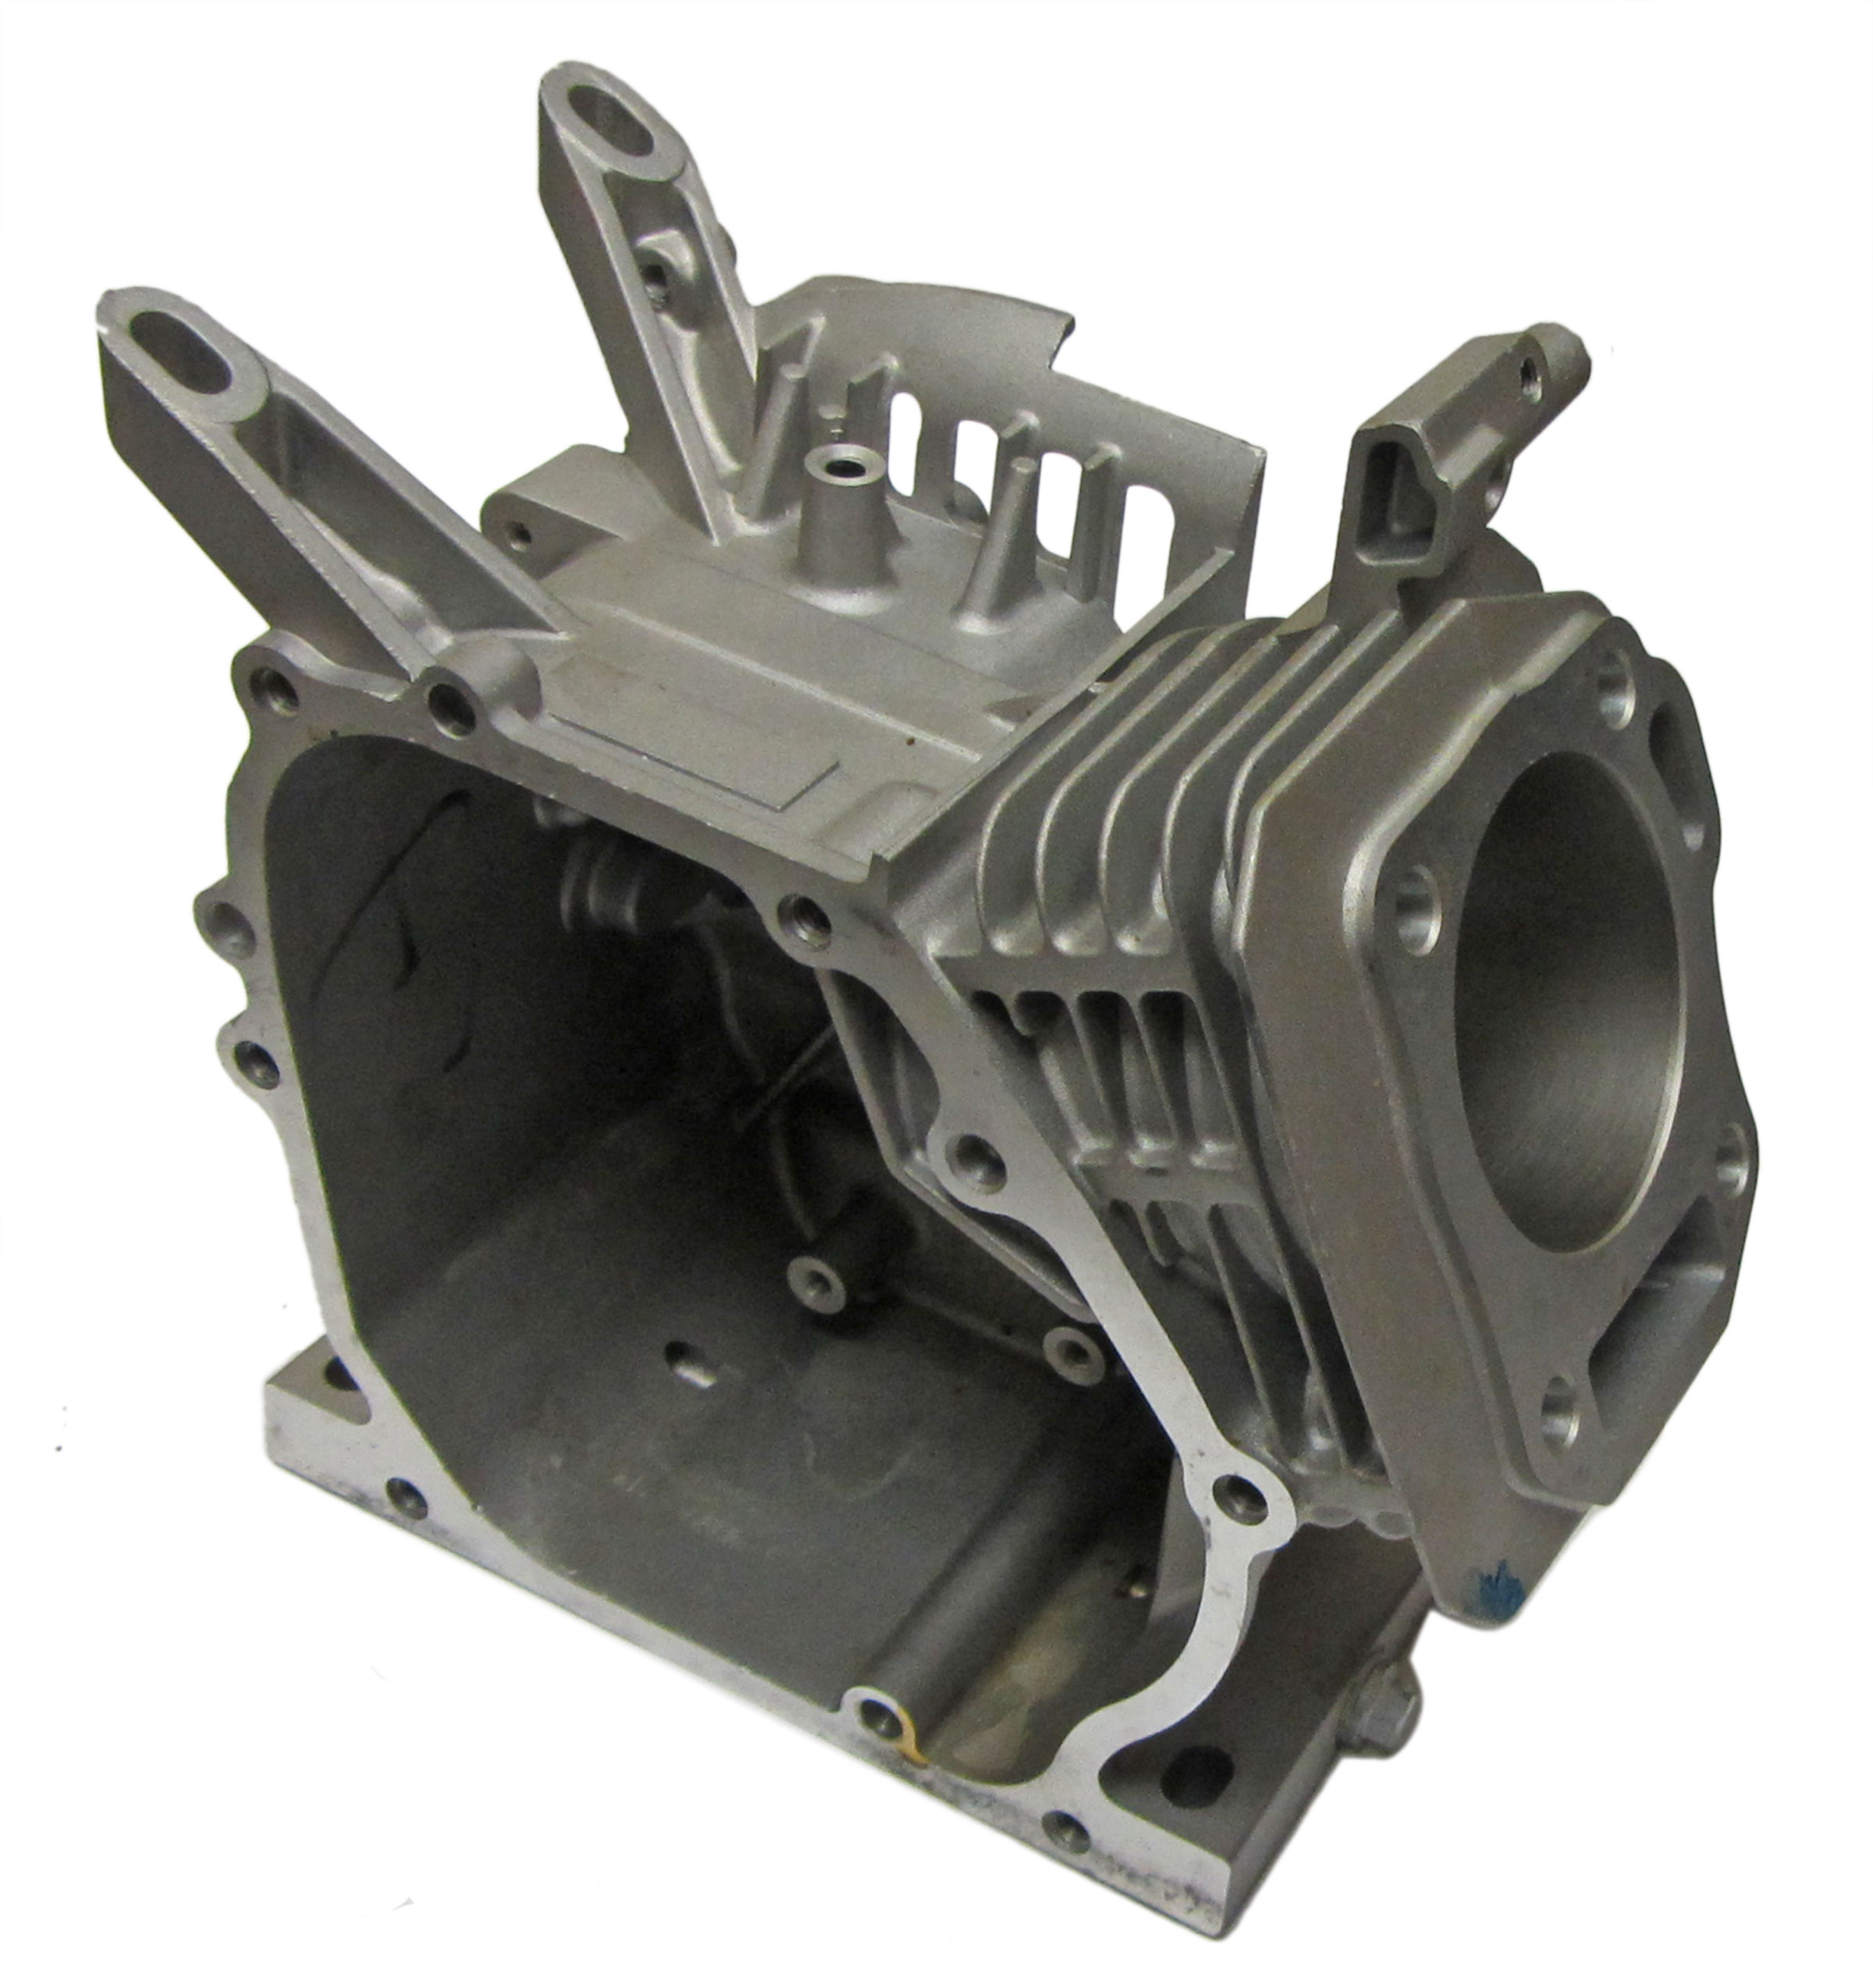 Crank Case Block for 5 5HP Clone or Honda GX160 Engine Motor Cylinder New